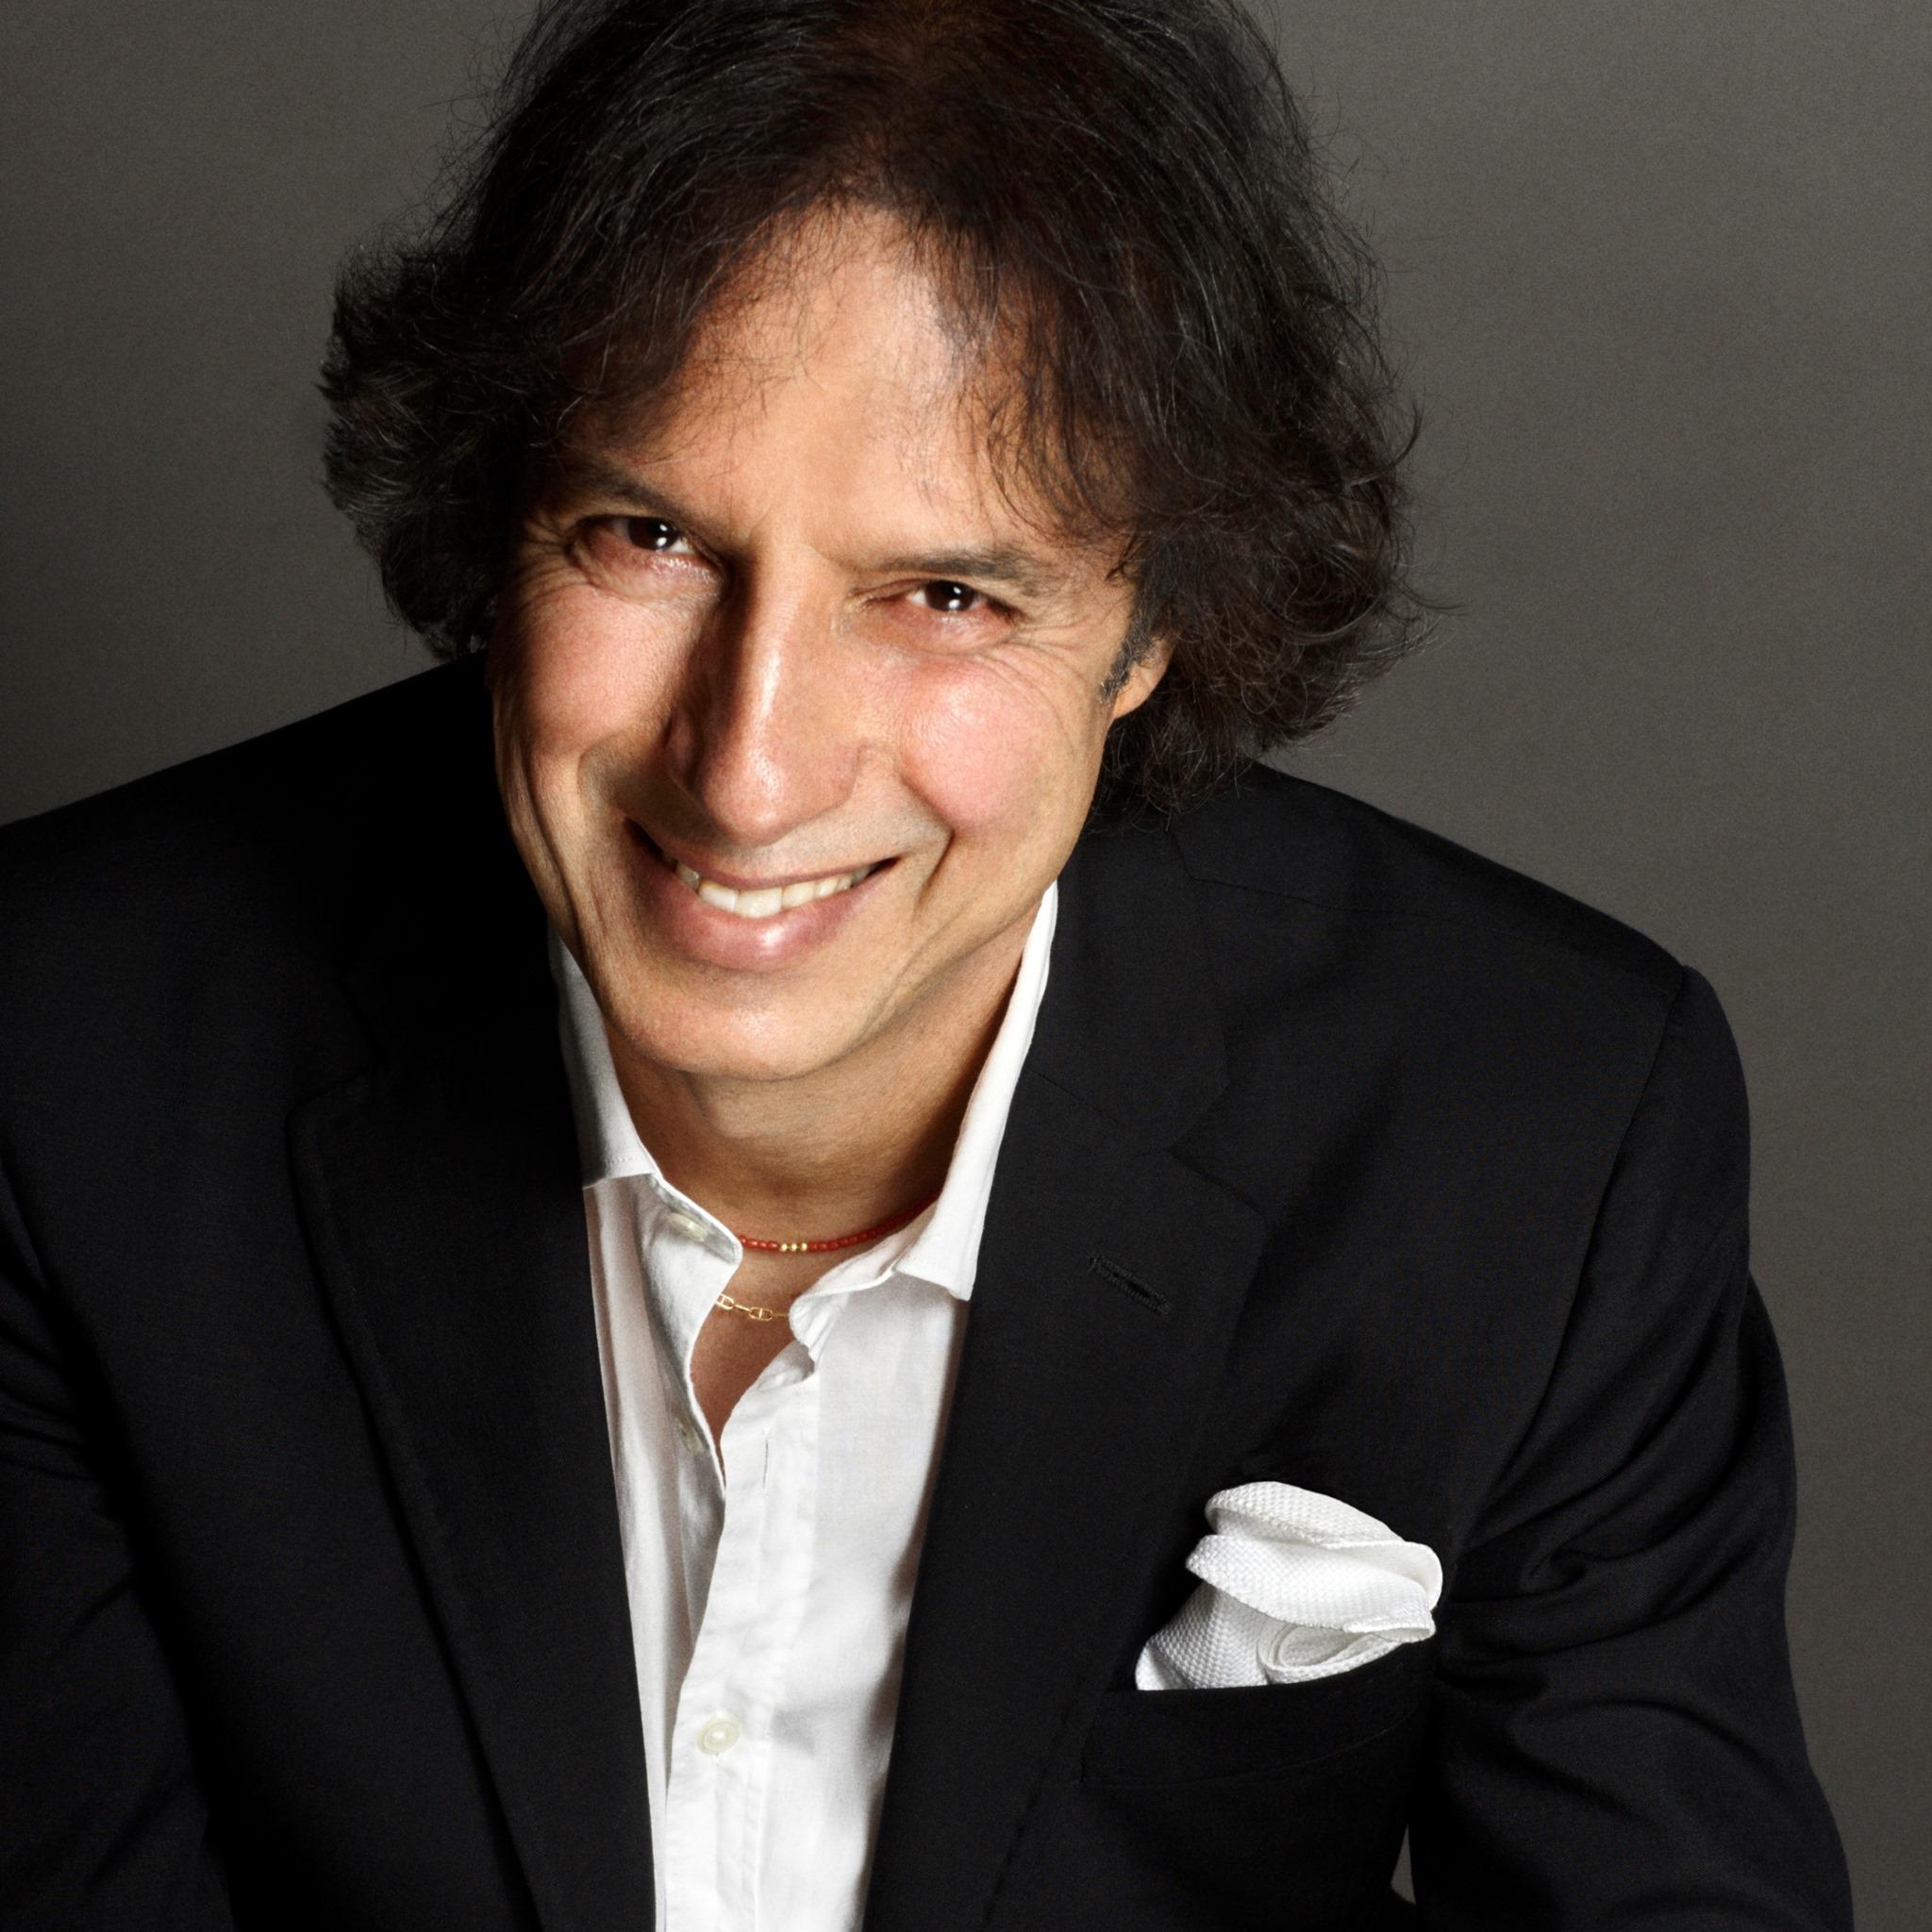 Maurizio Sangineto